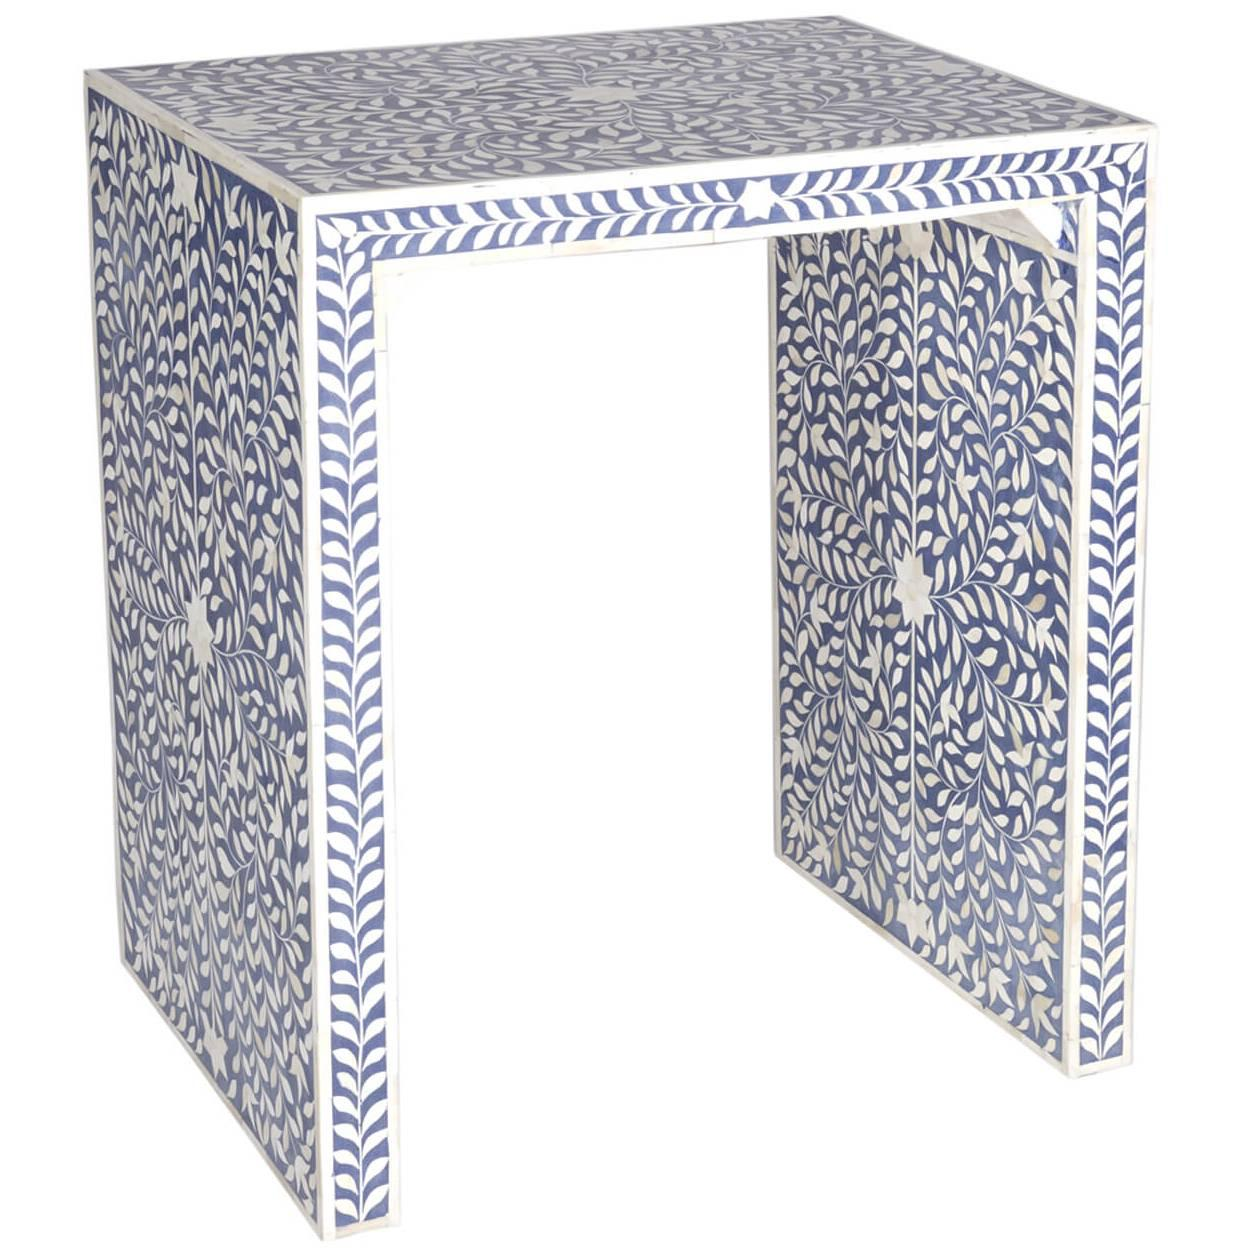 Captivating Blue Bone And Inlay Table At 1stdibs